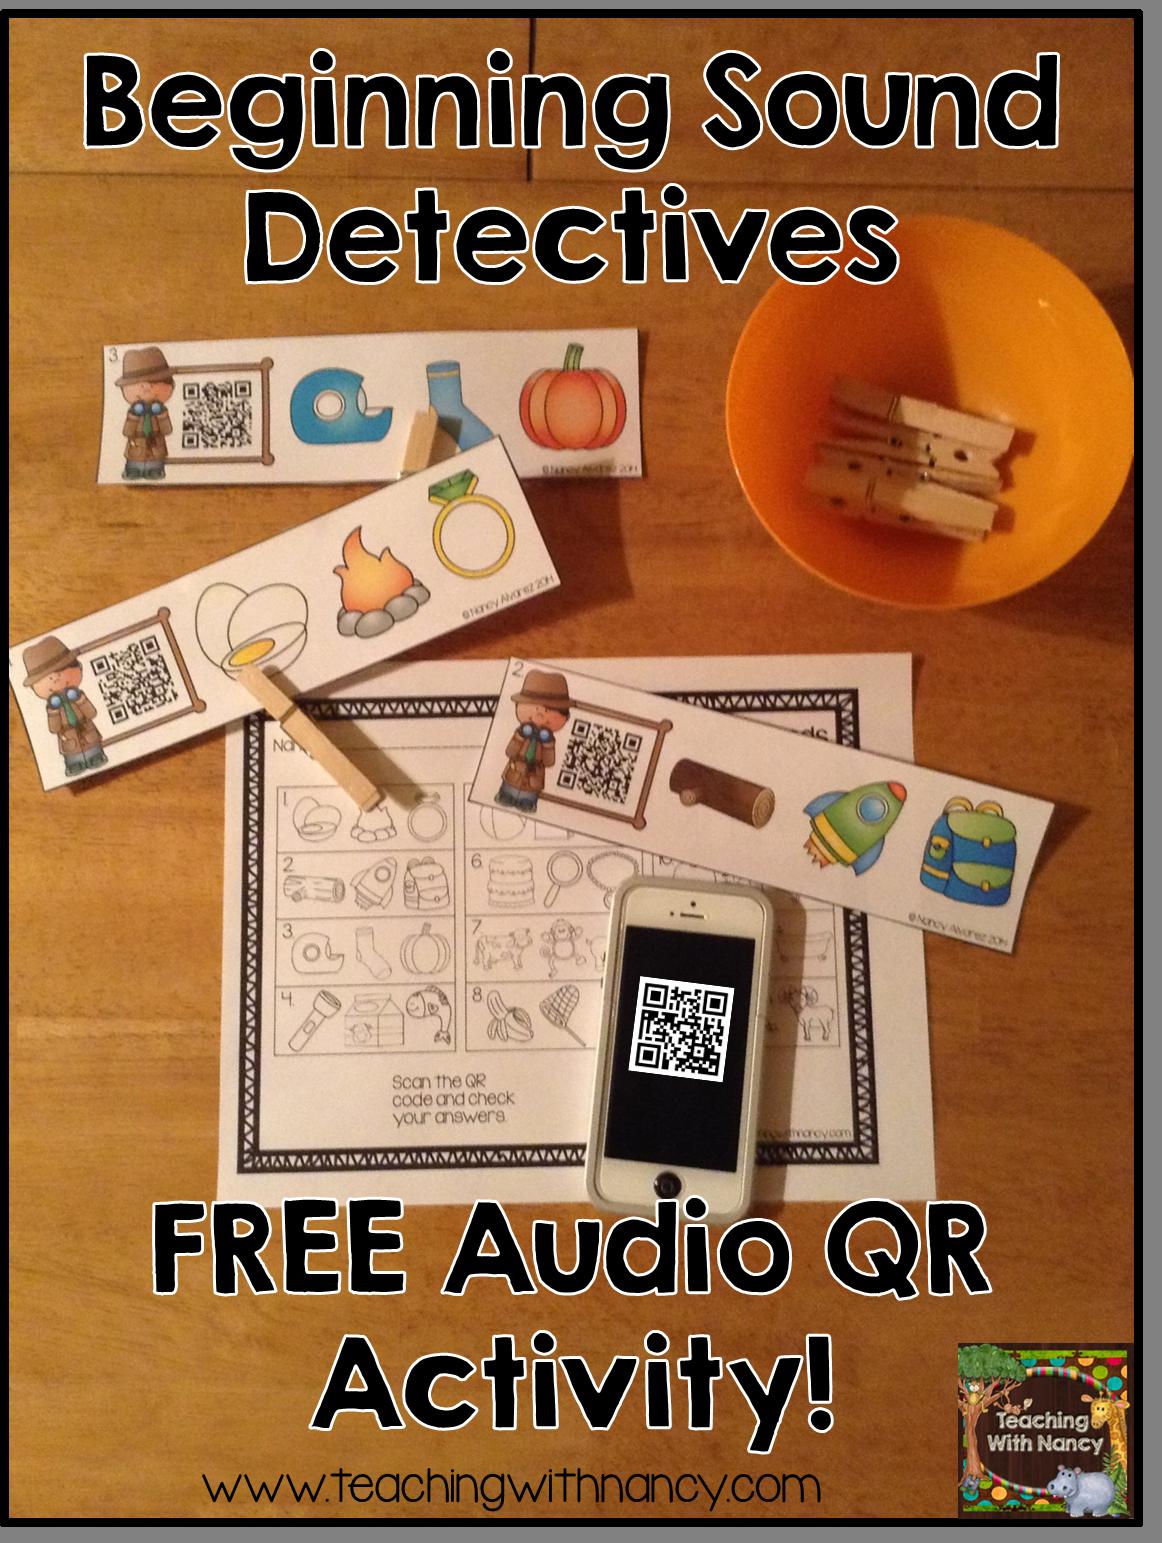 Beginning Sound Detectives Free Qr Code Activity